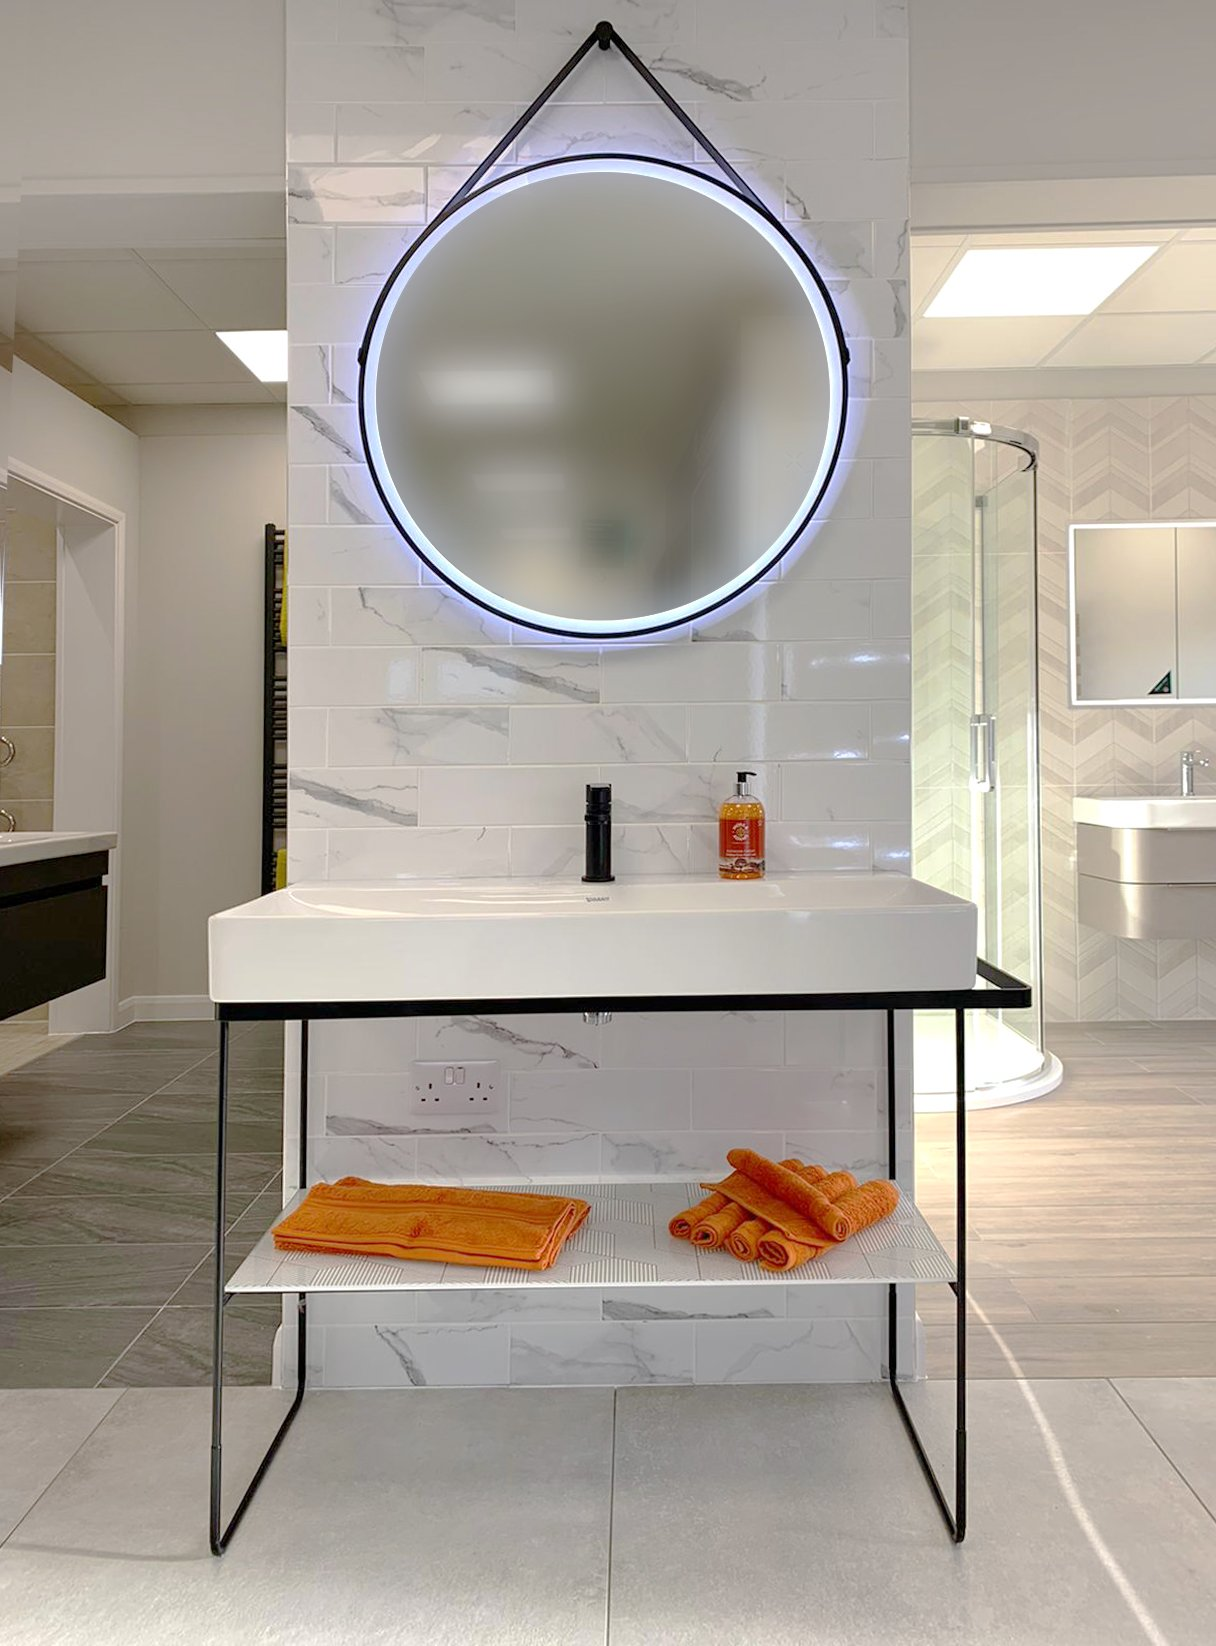 Statement black line contemporary bathroom vanity with storage and iluminated mirror